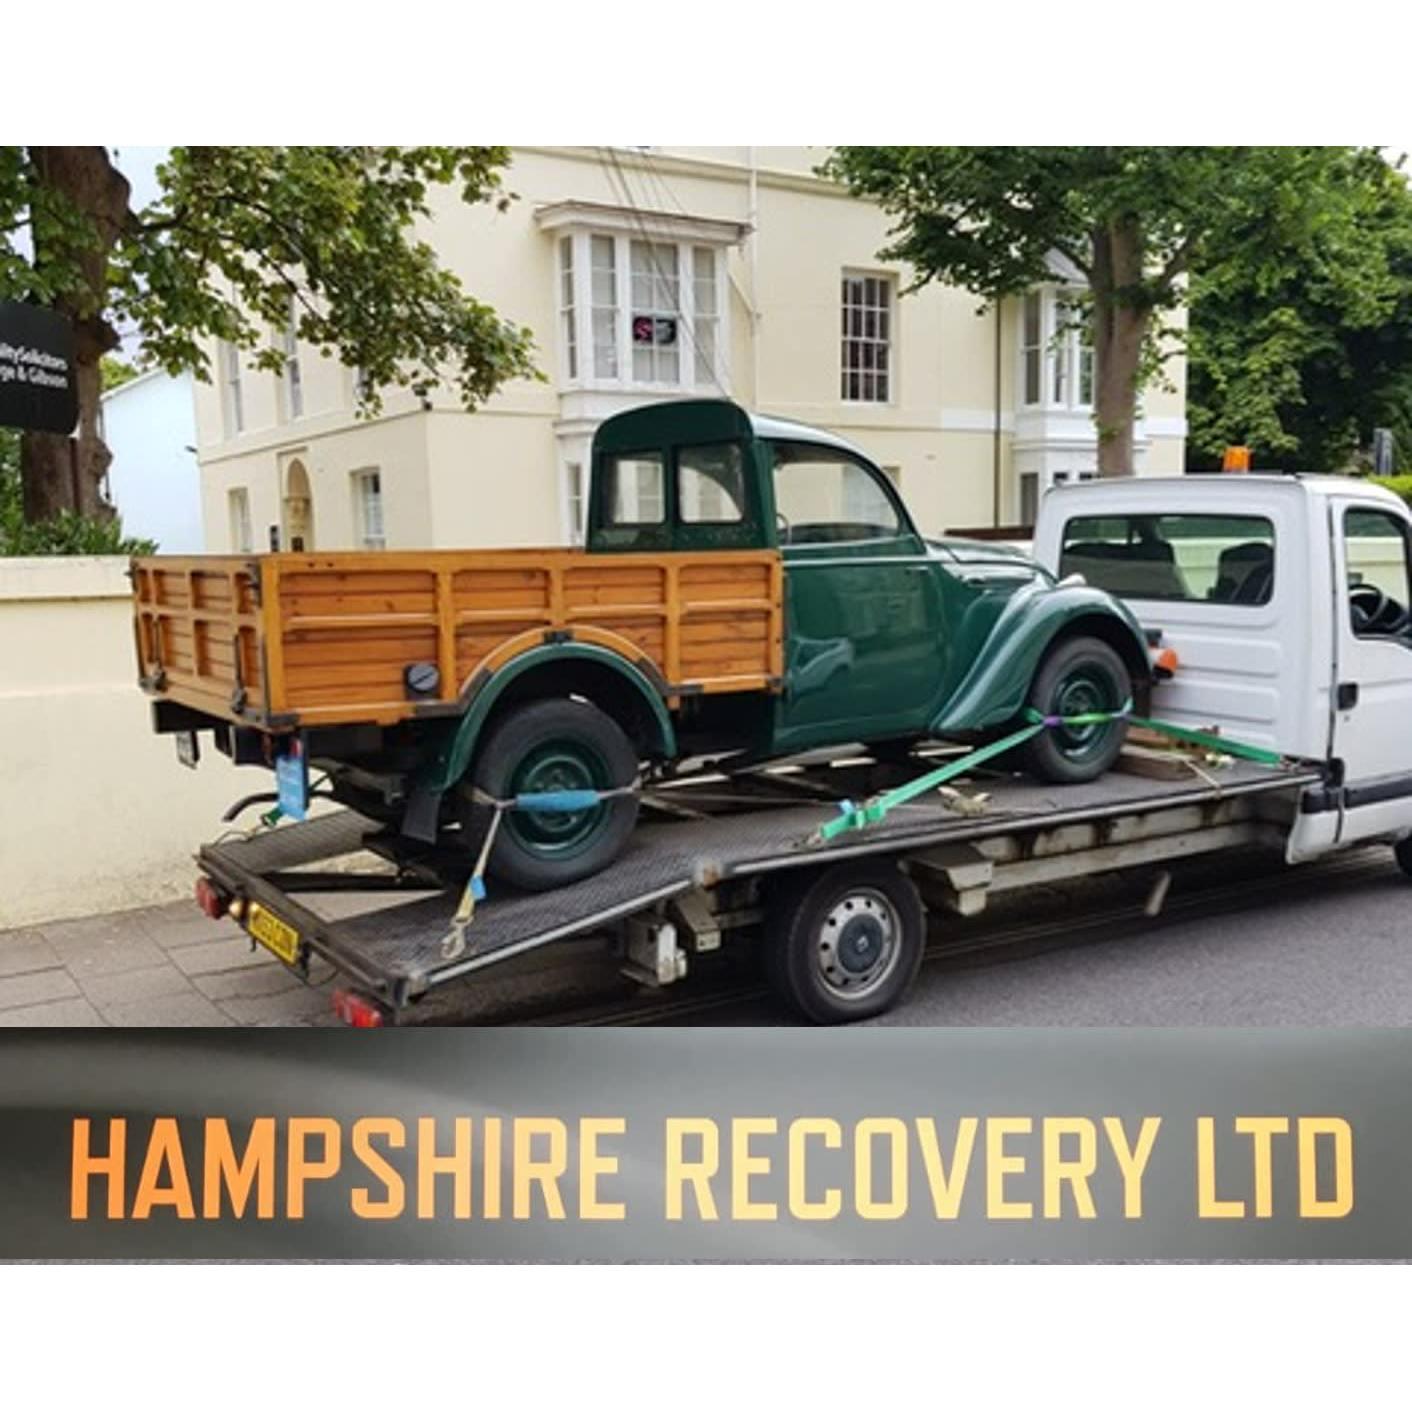 Hampshire Recovery Ltd - Portsmouth, Hampshire PO6 3PF - 07804 775658 | ShowMeLocal.com